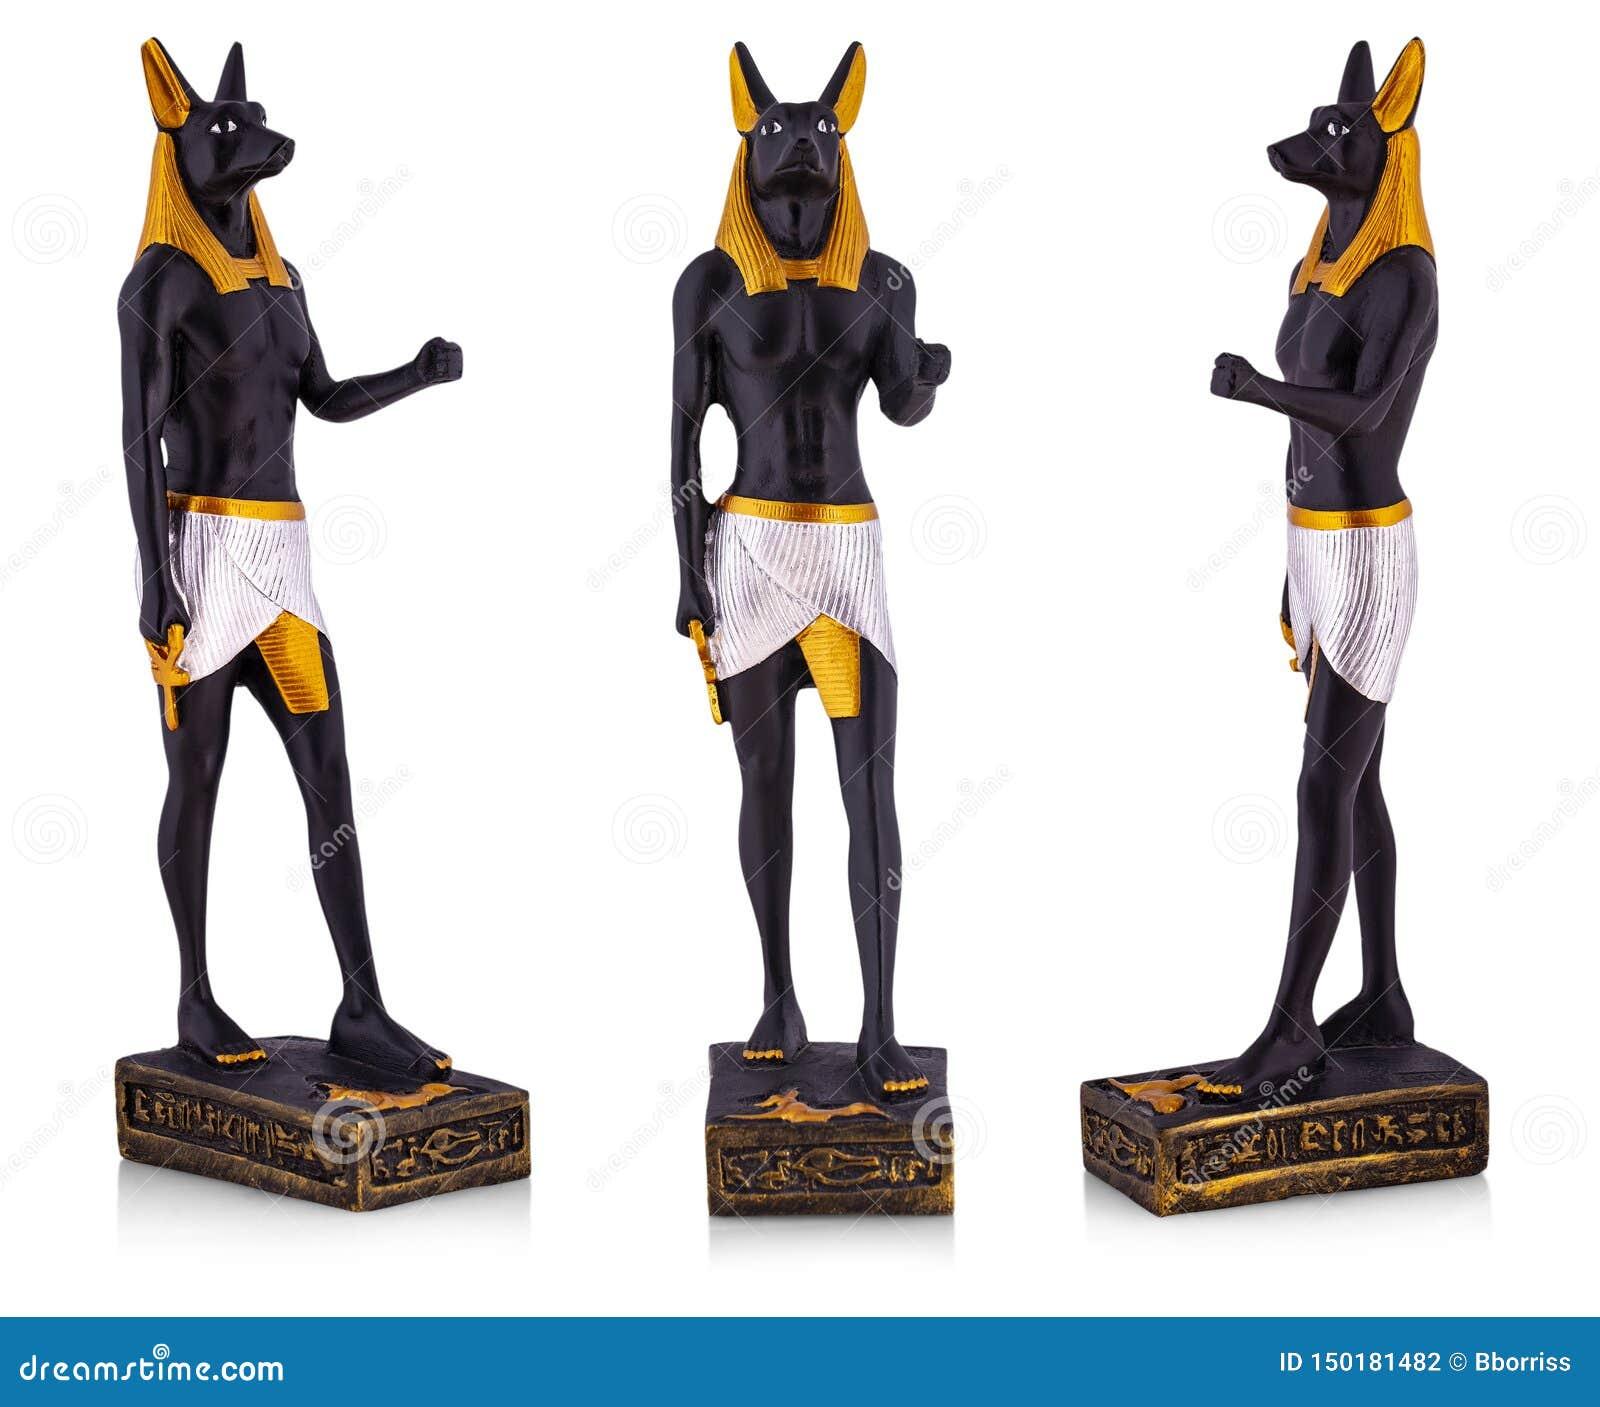 The Egyptian Ancient Art Anubis Sculpture Figurine Statue On